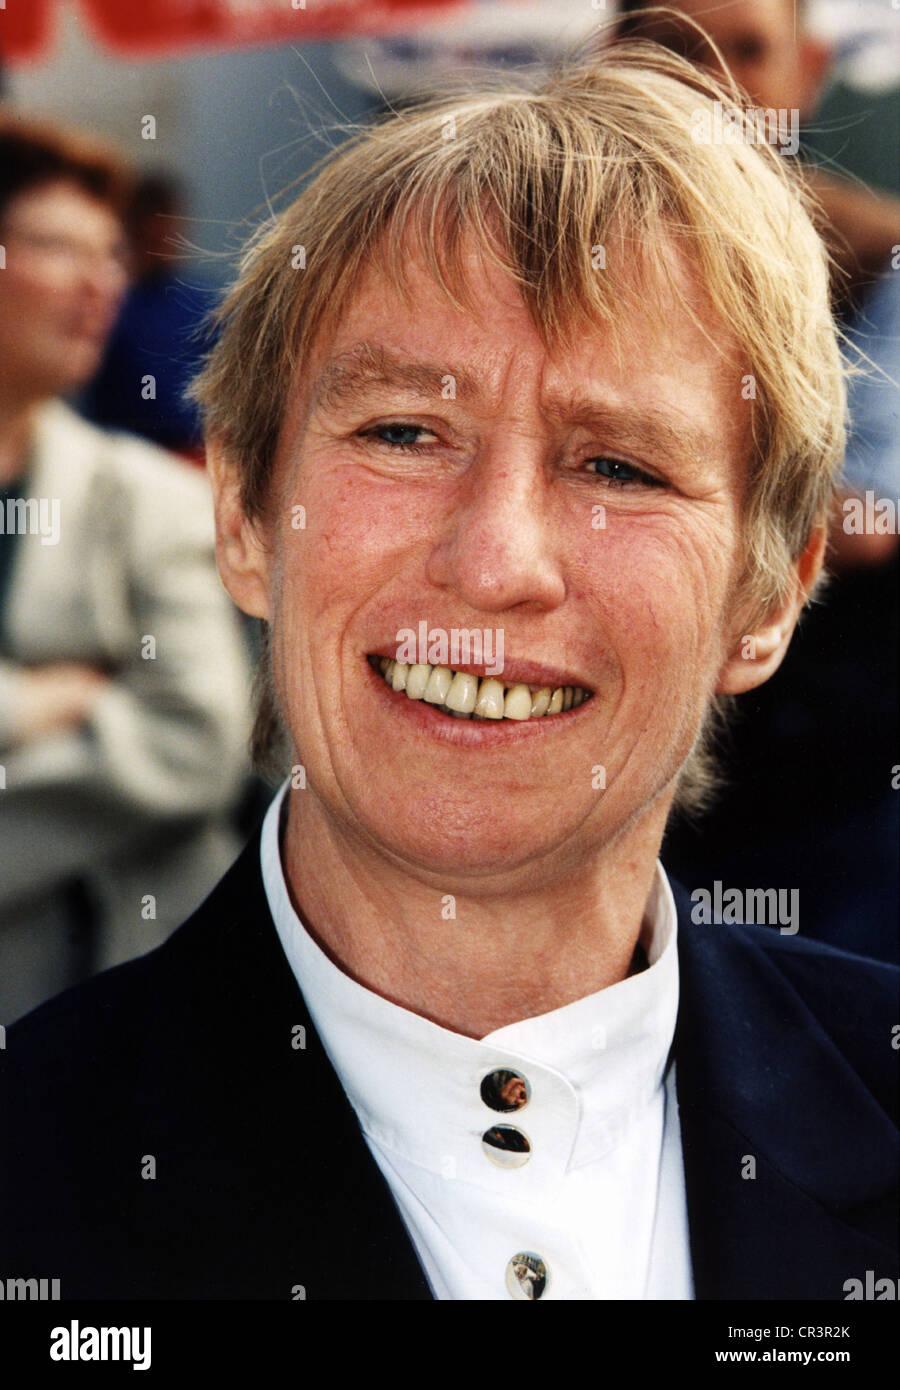 Hildebrandt, Regine, 26.4.1941 - 26.11.2001, German politician (SPD), labour minister (1990), portrait, 1999, Additional Stock Photo